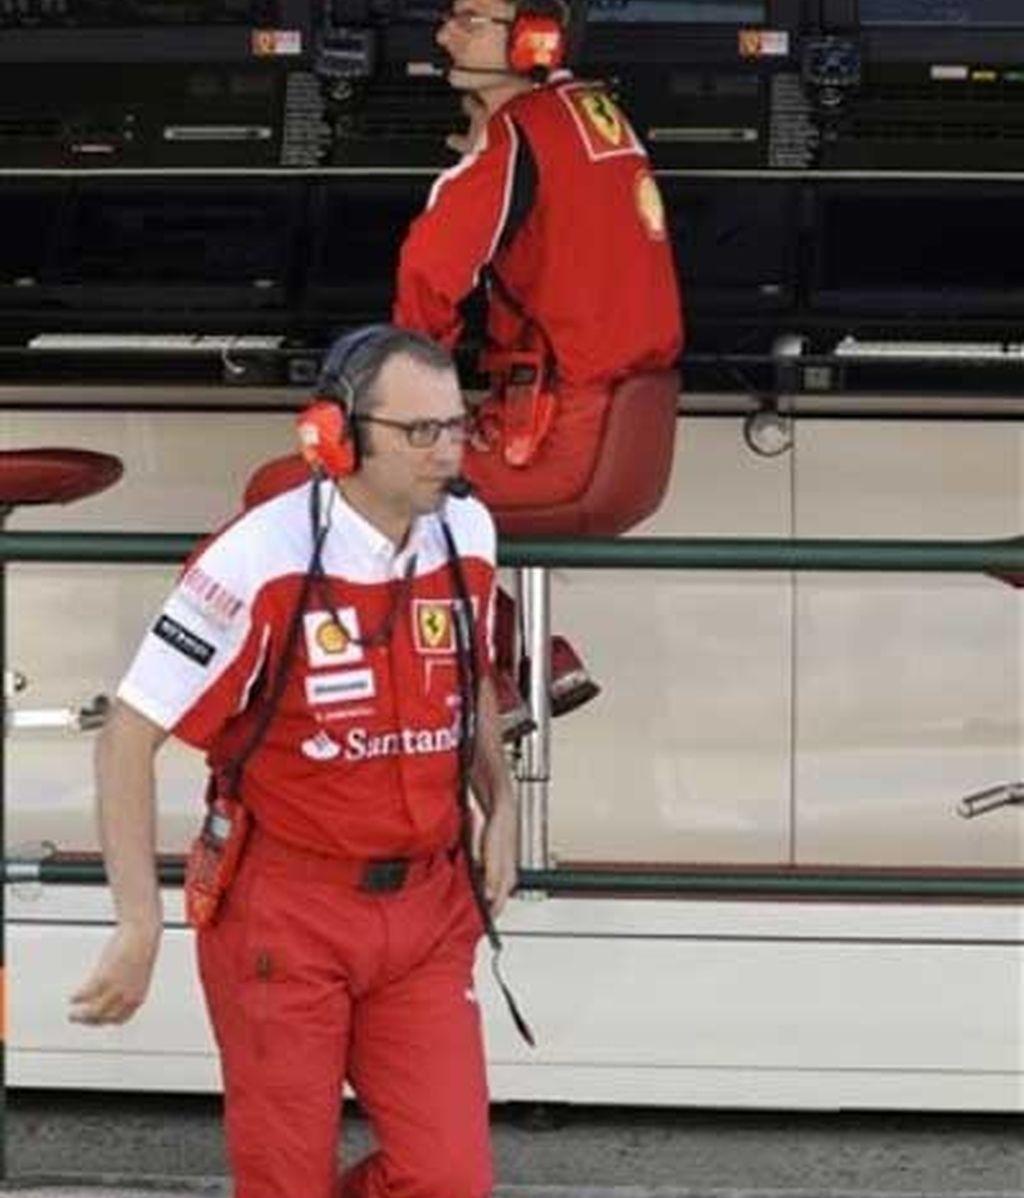 Ferrari busca limpiar su imagen